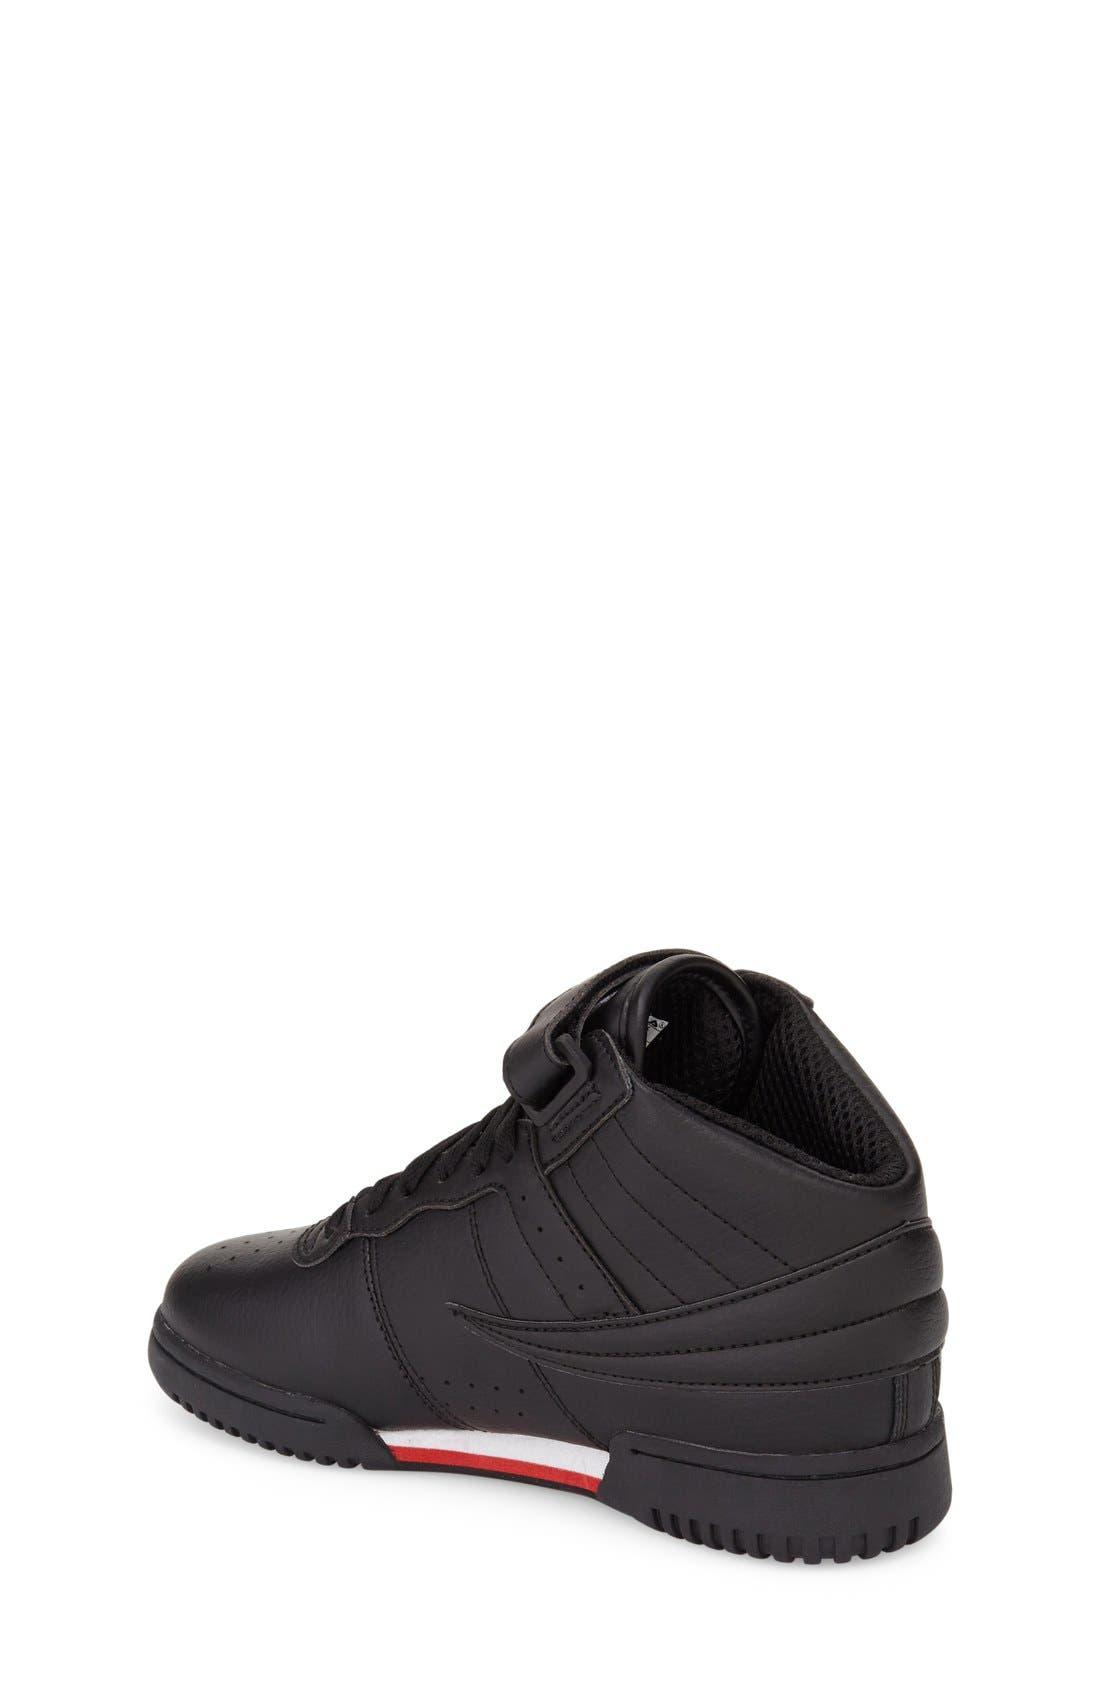 F-13 High Top Sneaker,                             Alternate thumbnail 2, color,                             001